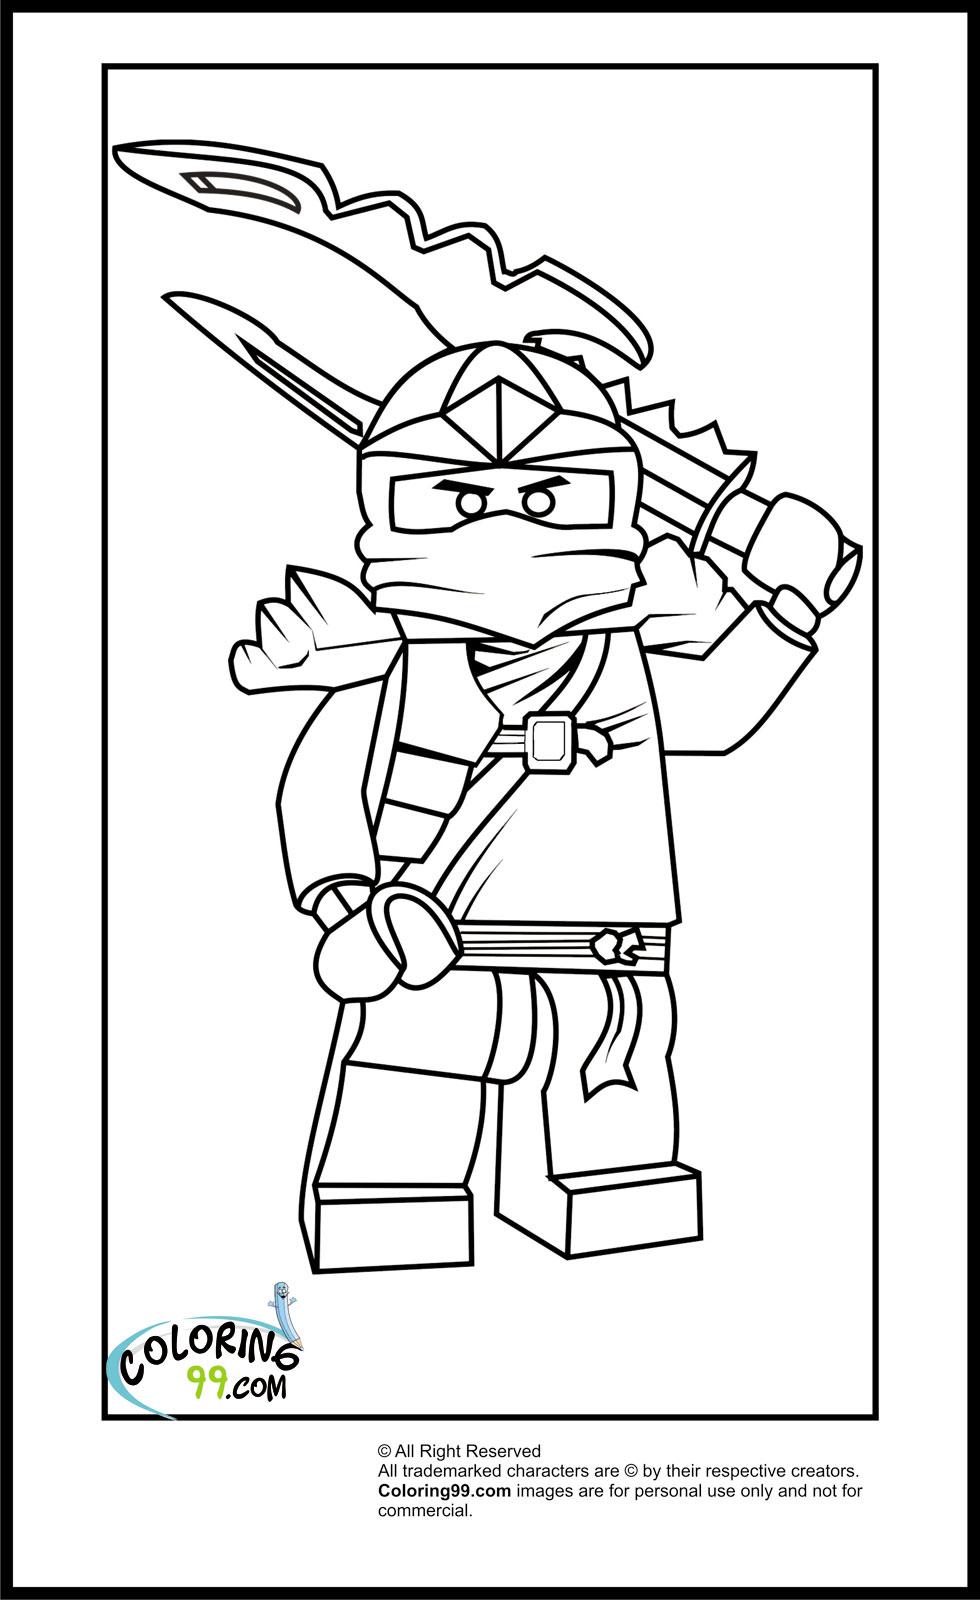 Lego ninjago coloring pages free printable pictures for Free lego printable coloring pages